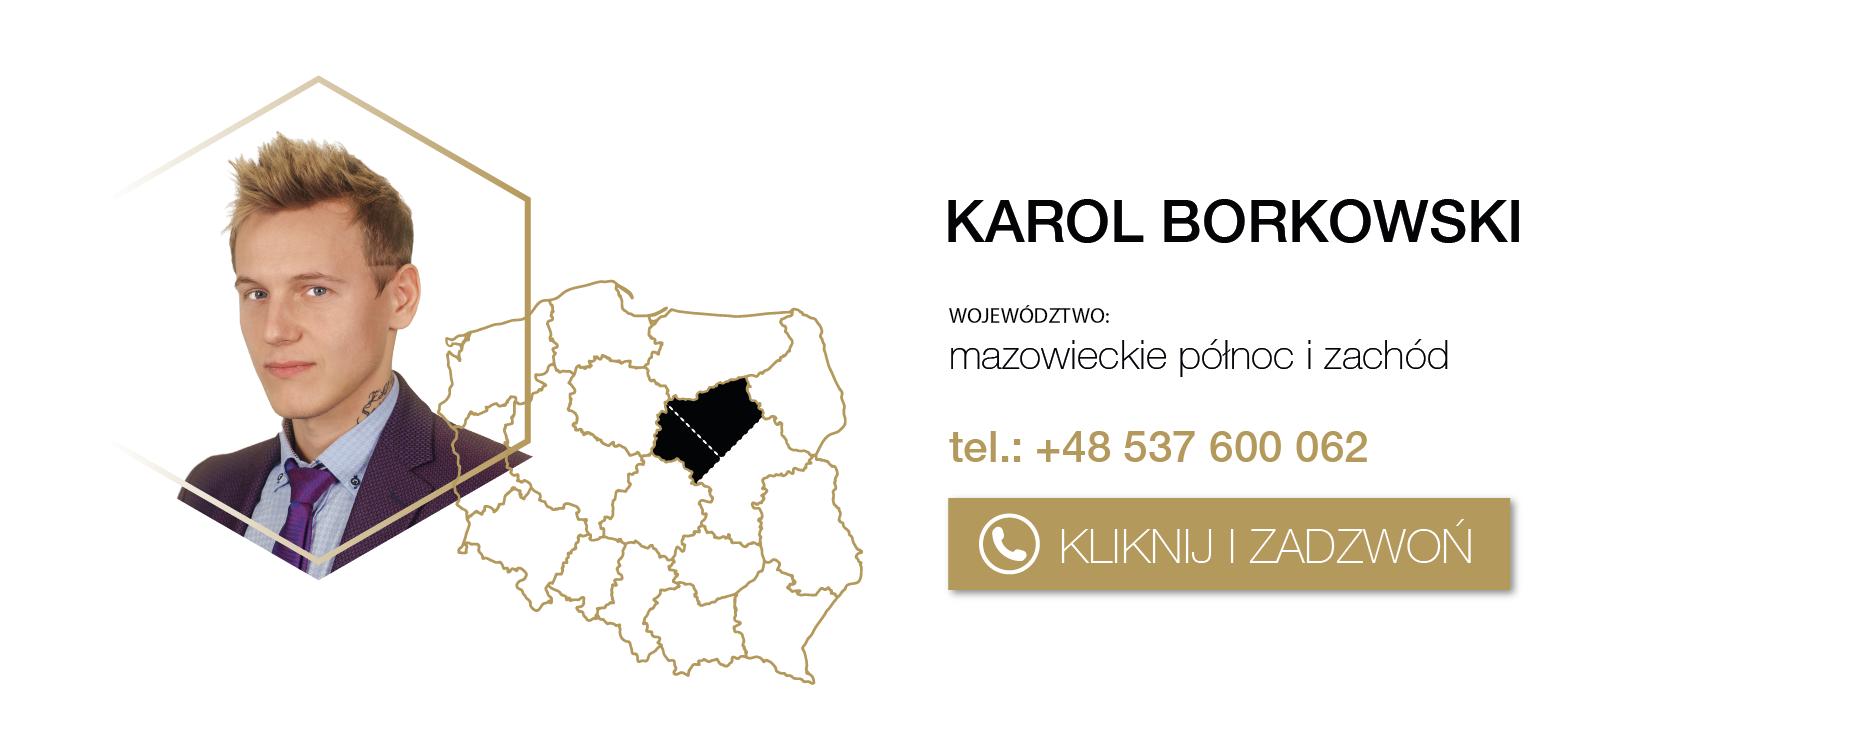 Karol Borkowski